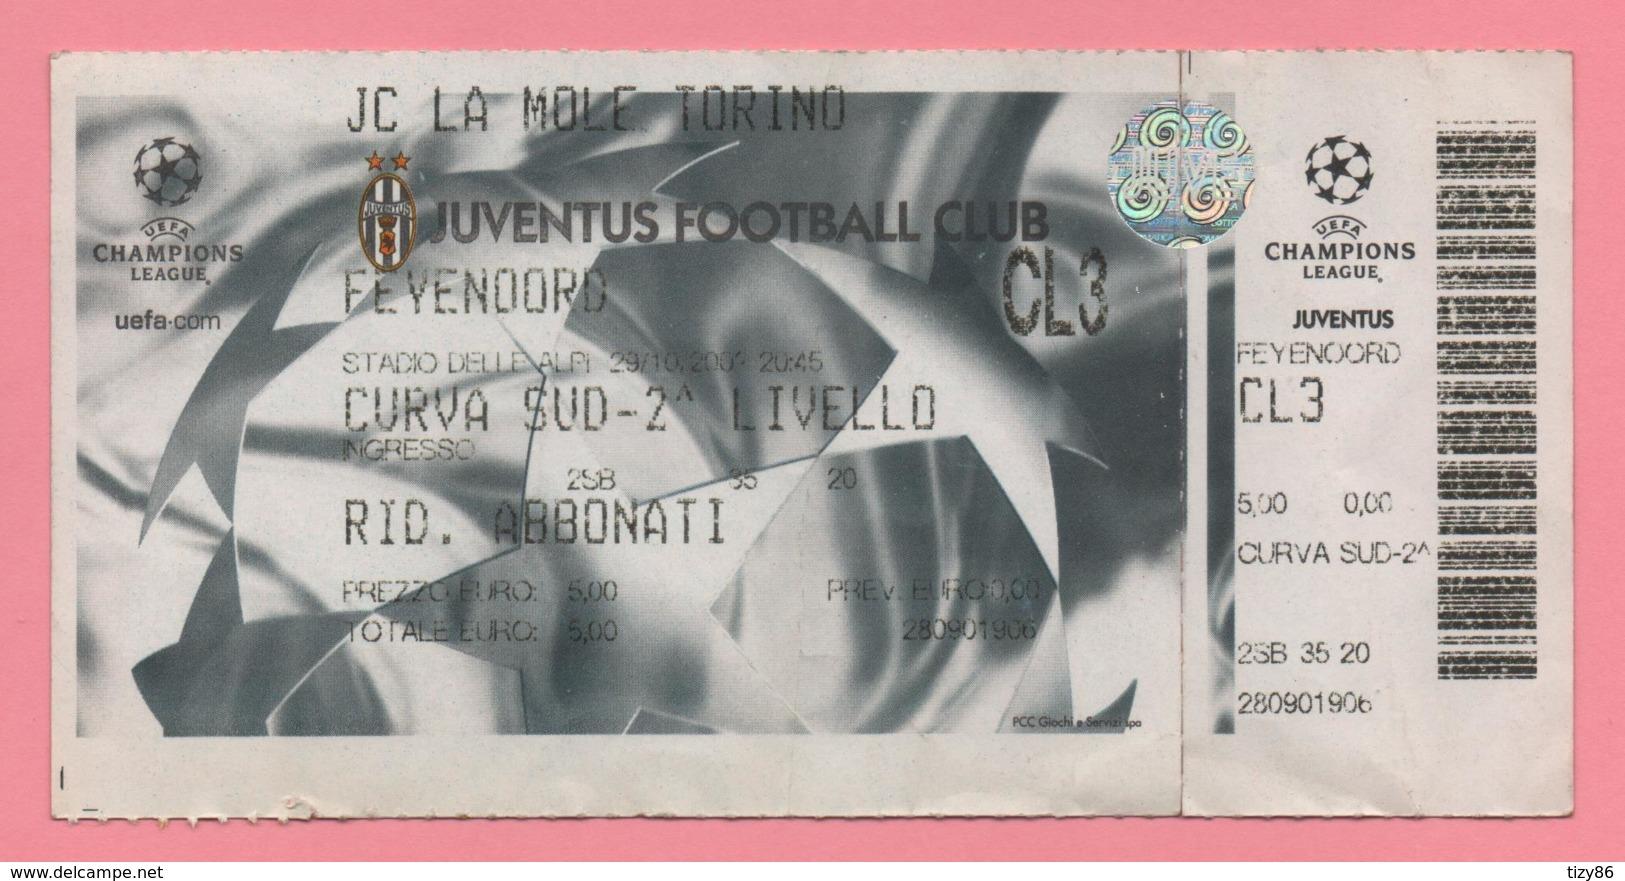 Biglietto D'ingresso Stadio Juventus Feyenoord - Toegangskaarten